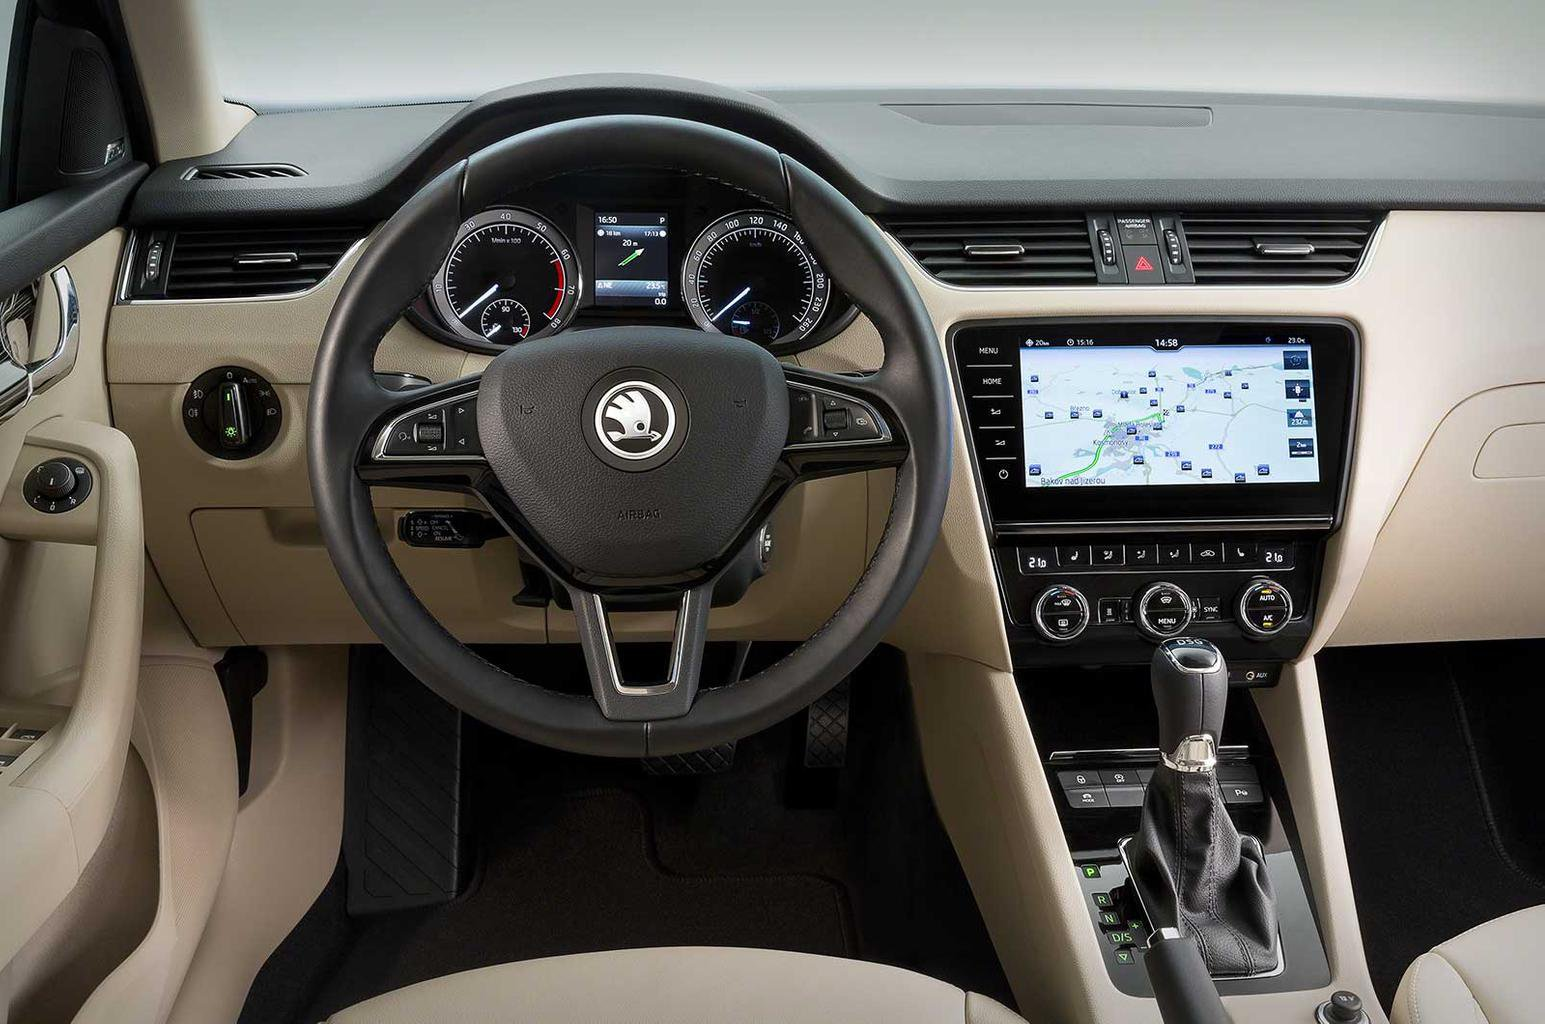 Skoda Octavia facelift revealed